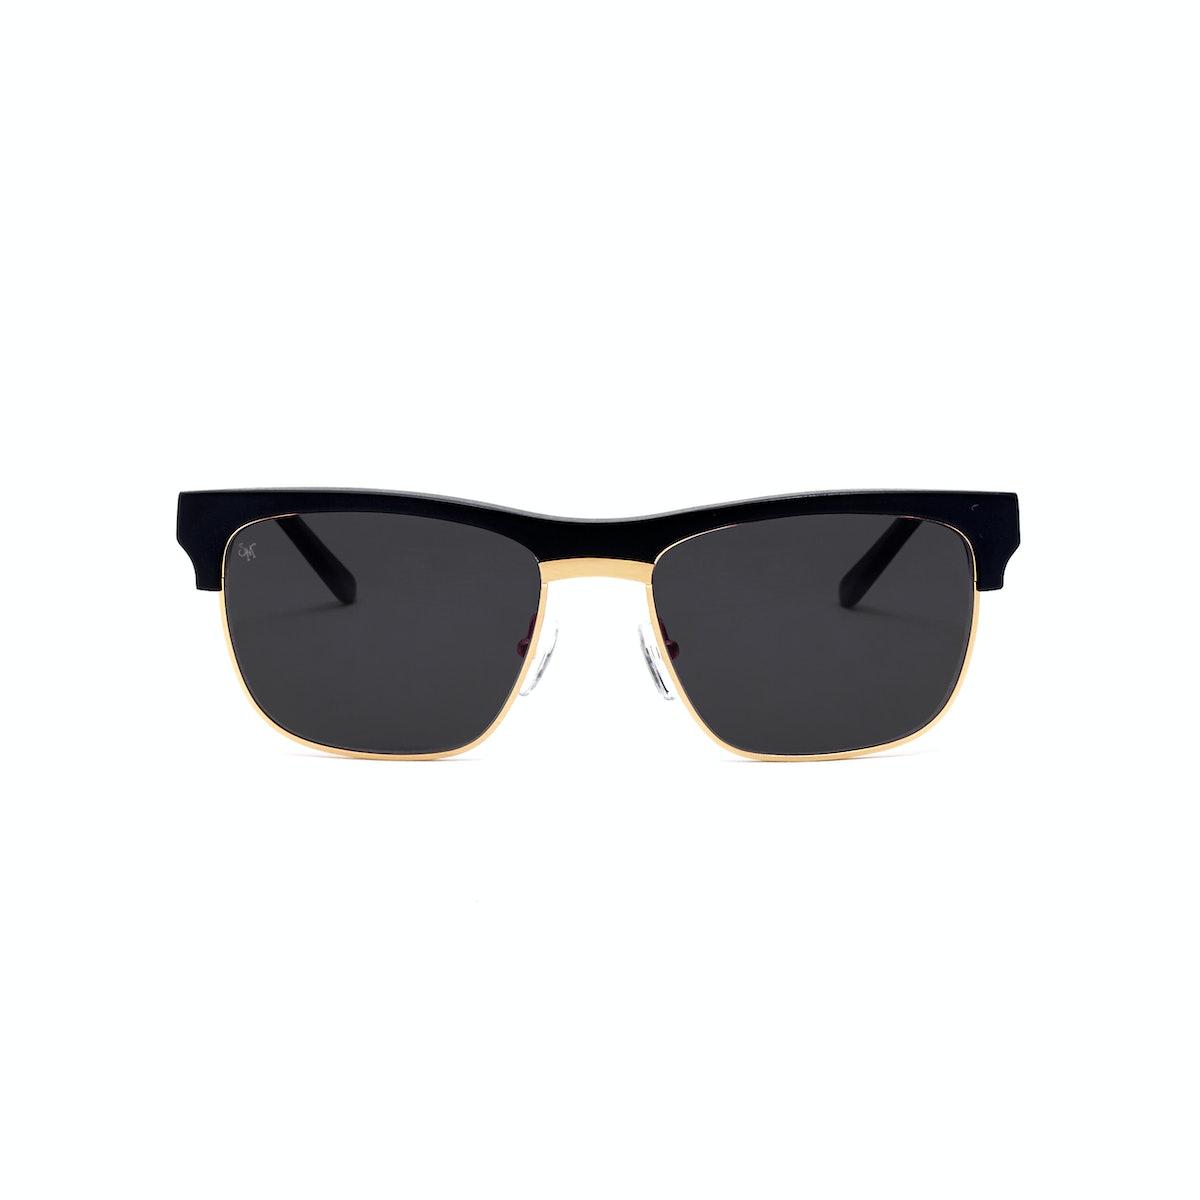 Smoke x Mirrors sunglasses